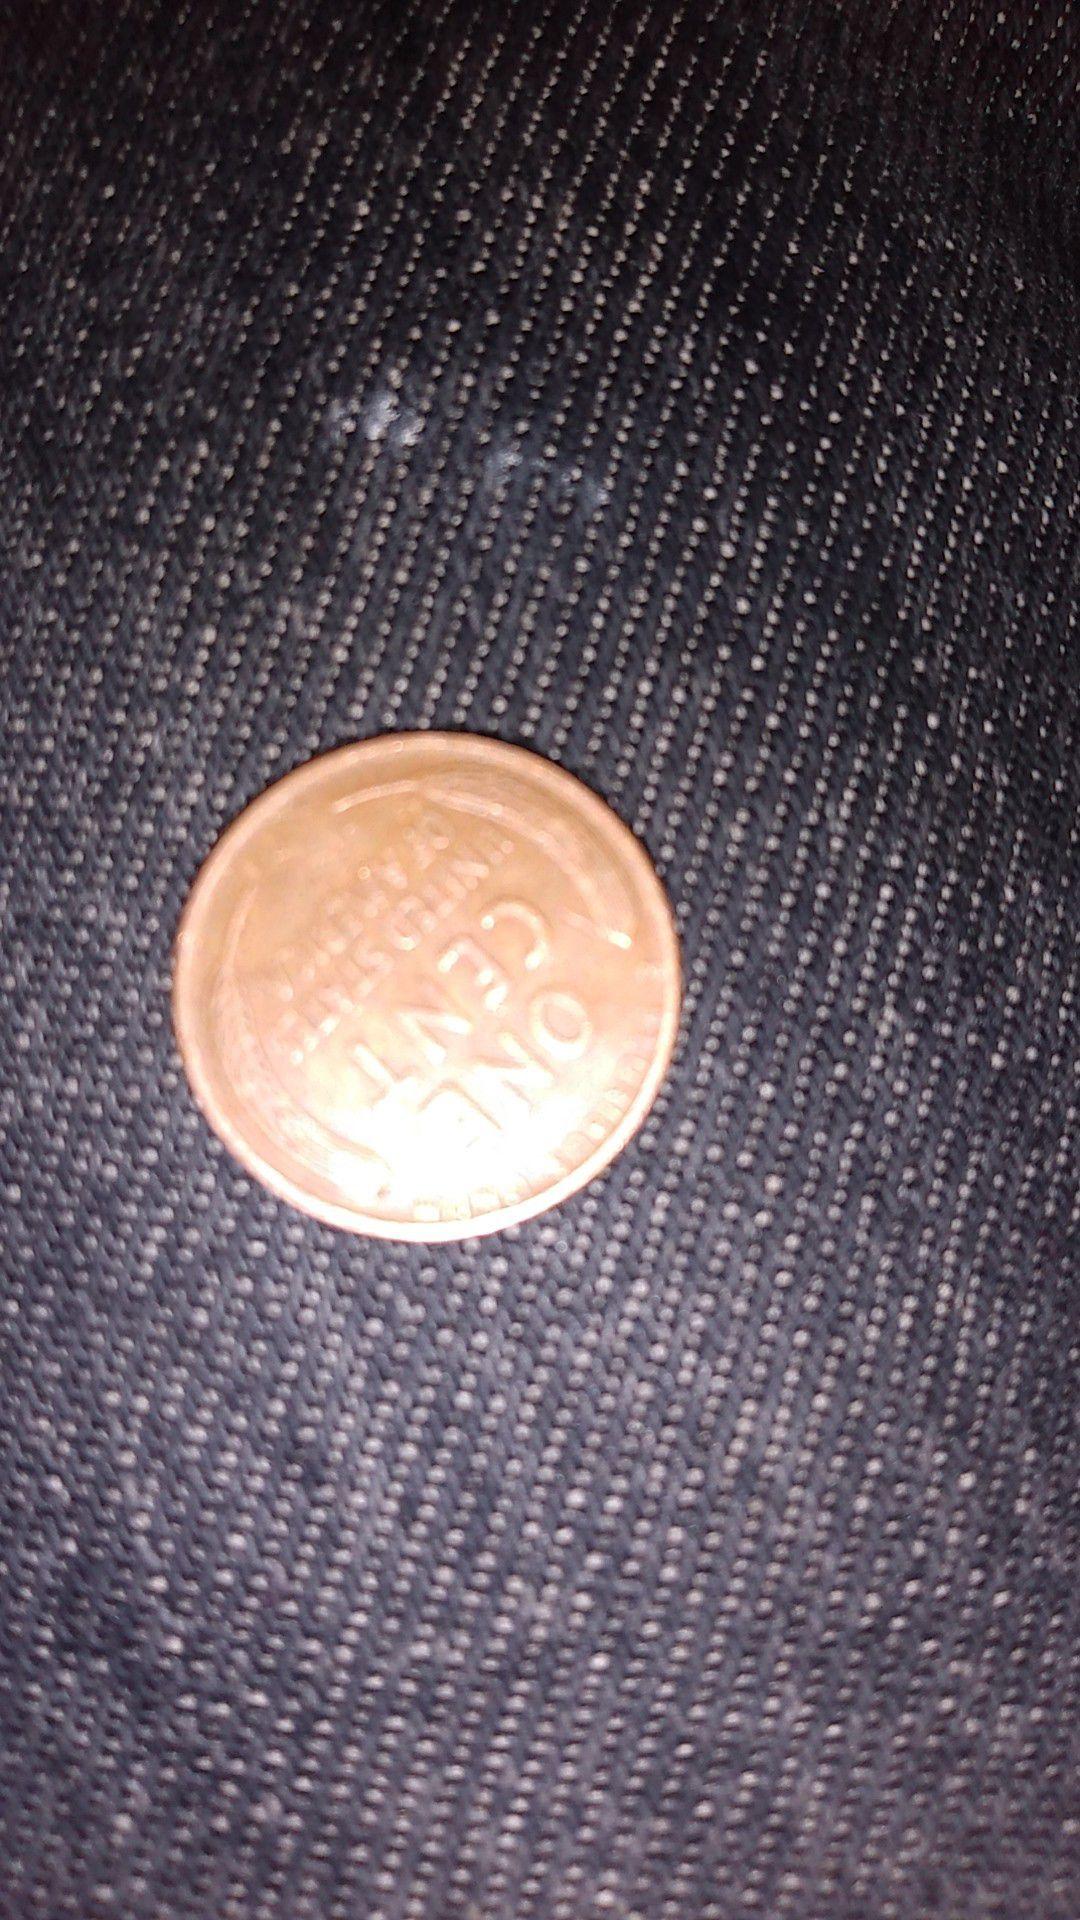 1956 wheat penny